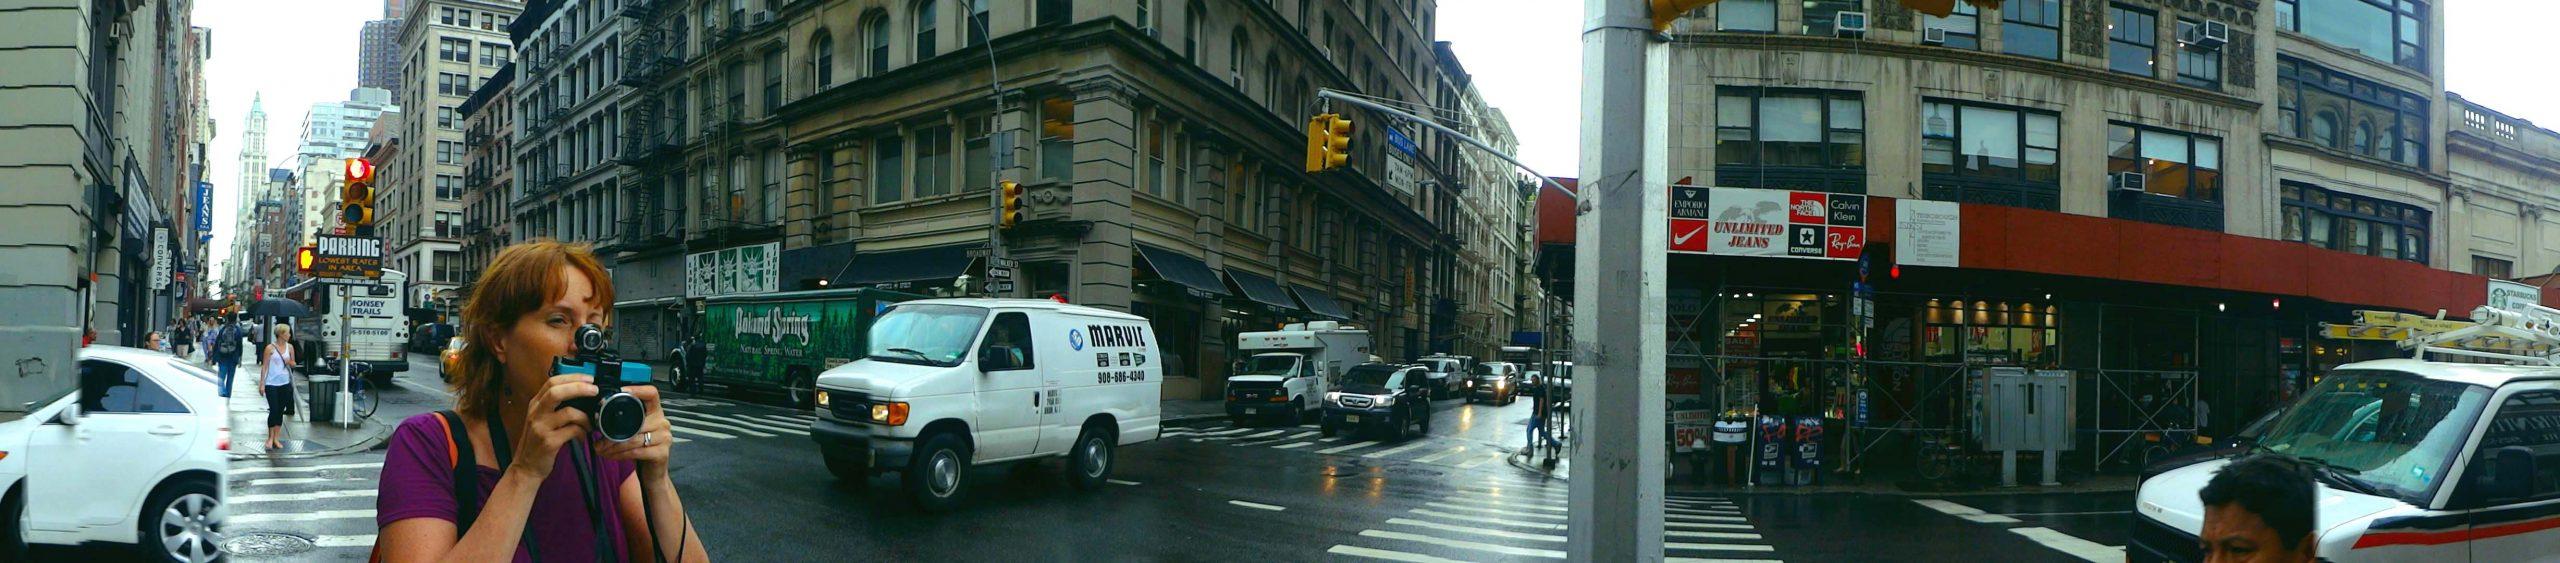 nyc street scene